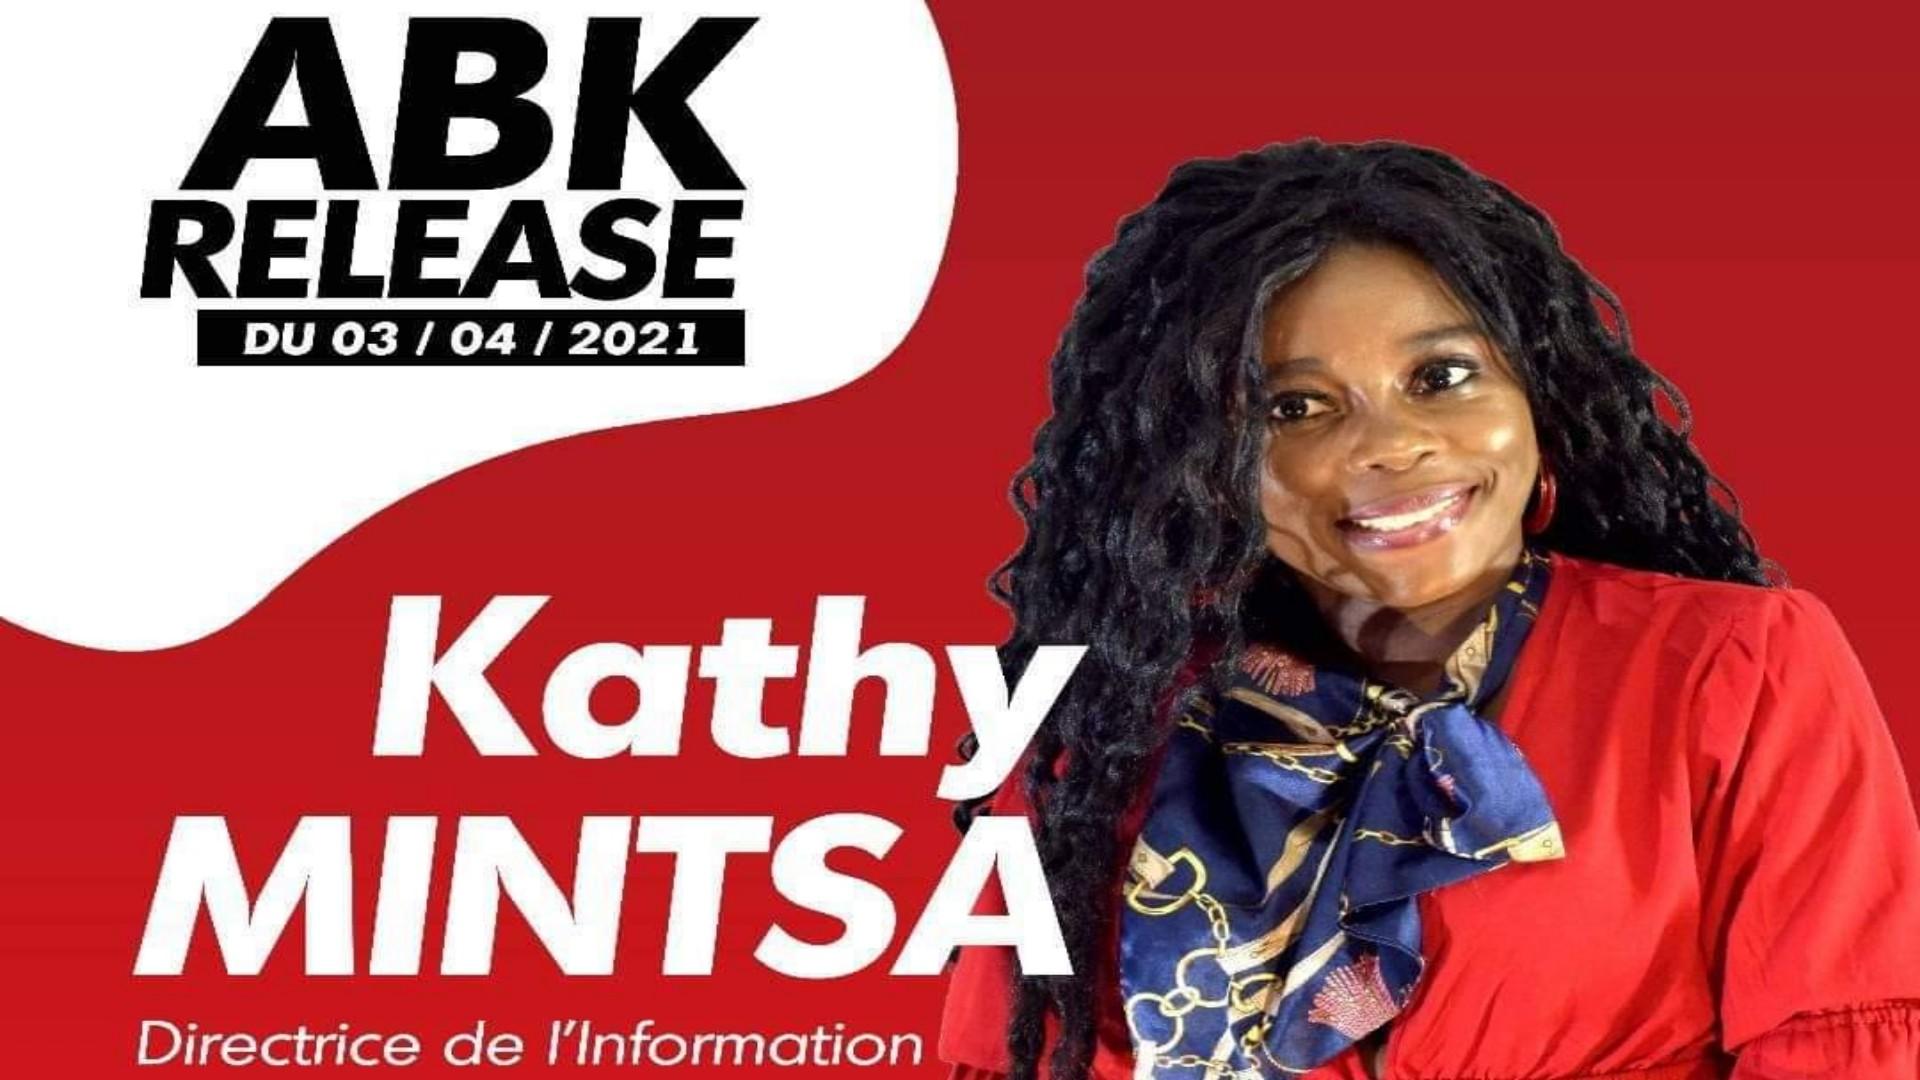 Kathy Mintsa nommée directrice de l'information d'ABK Radio